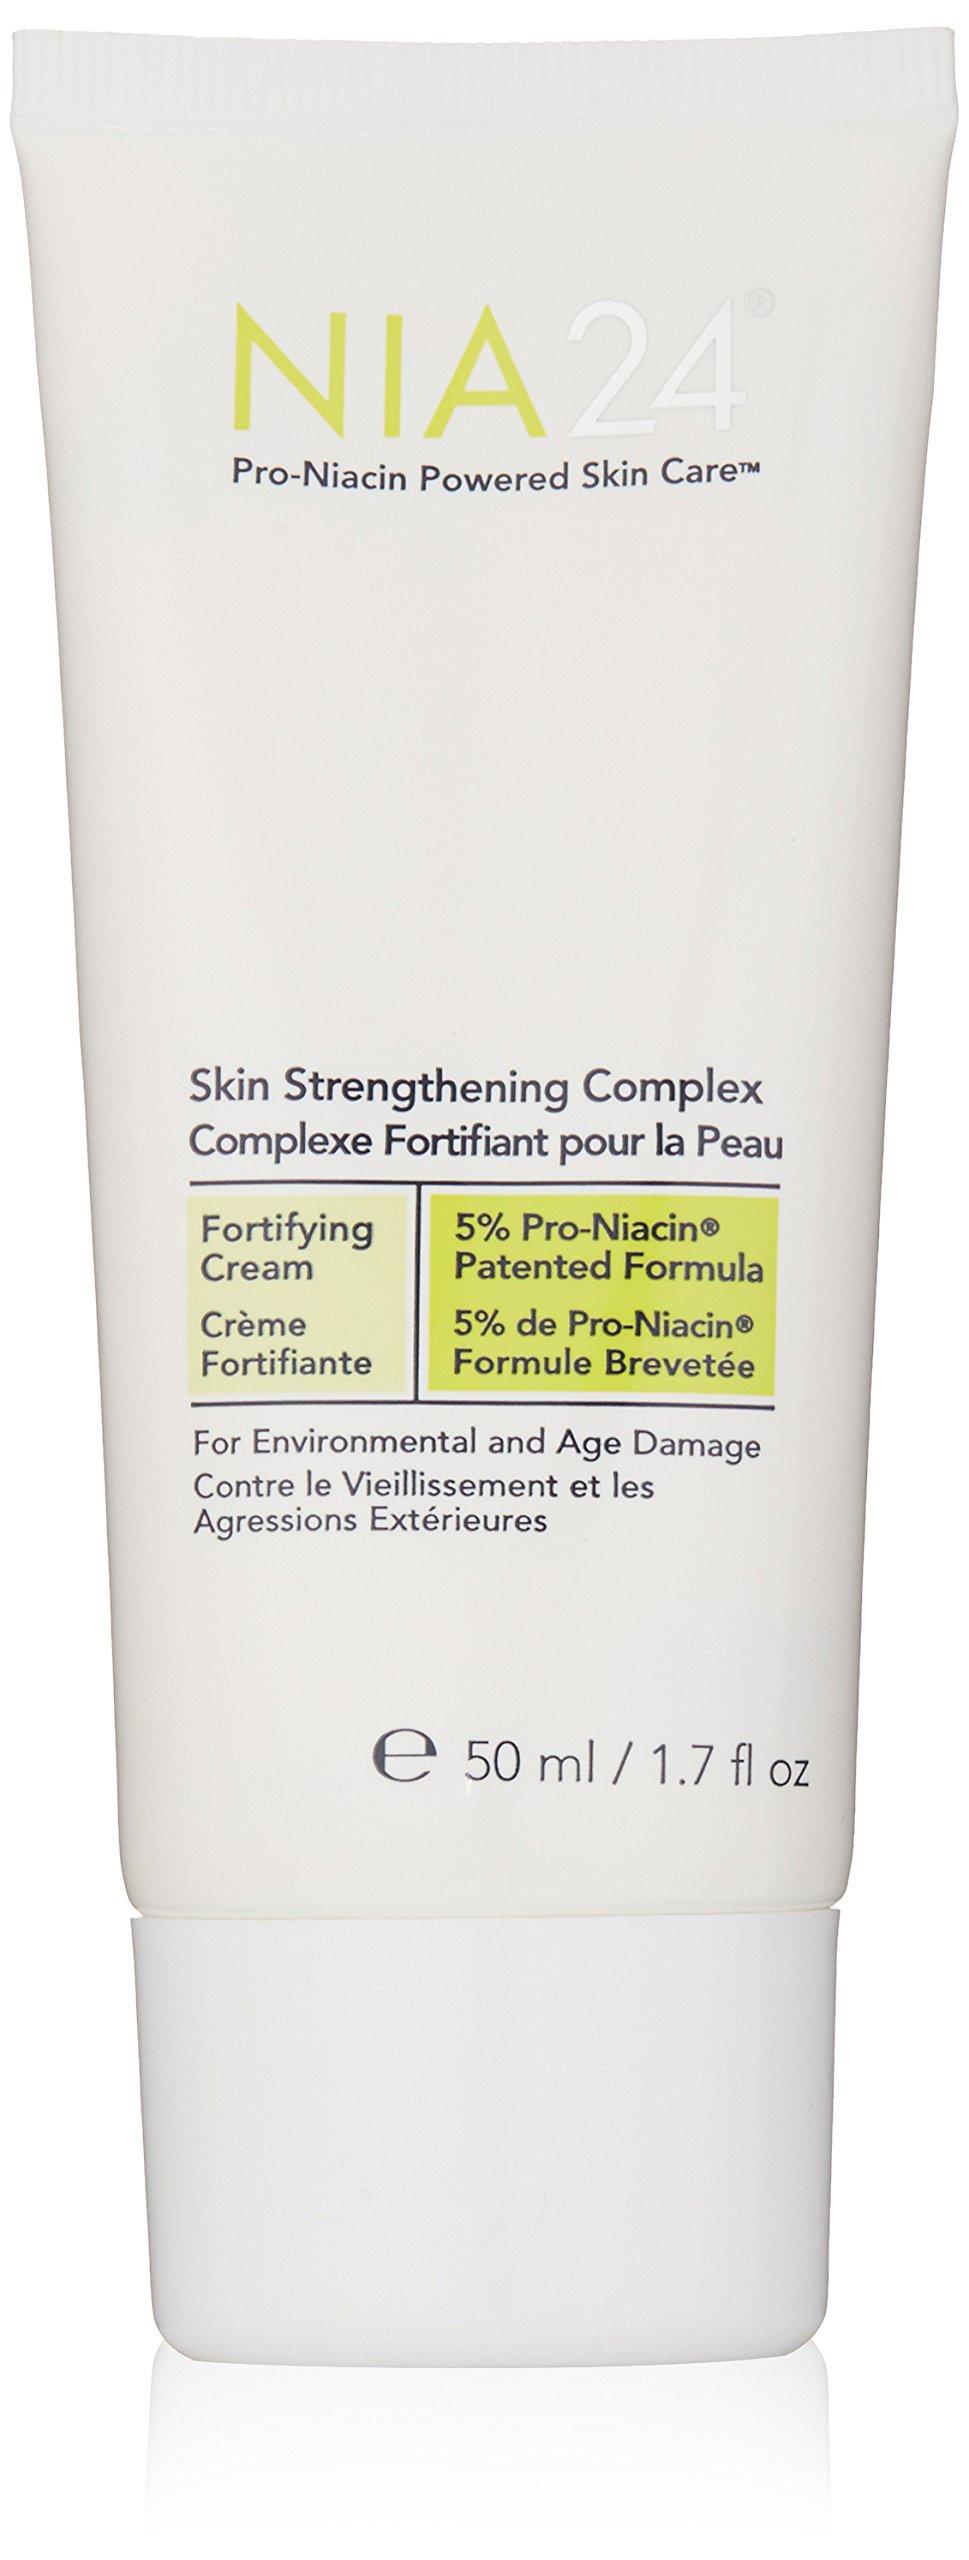 Nia 24 Skin Strengthening Complex by Nia 24